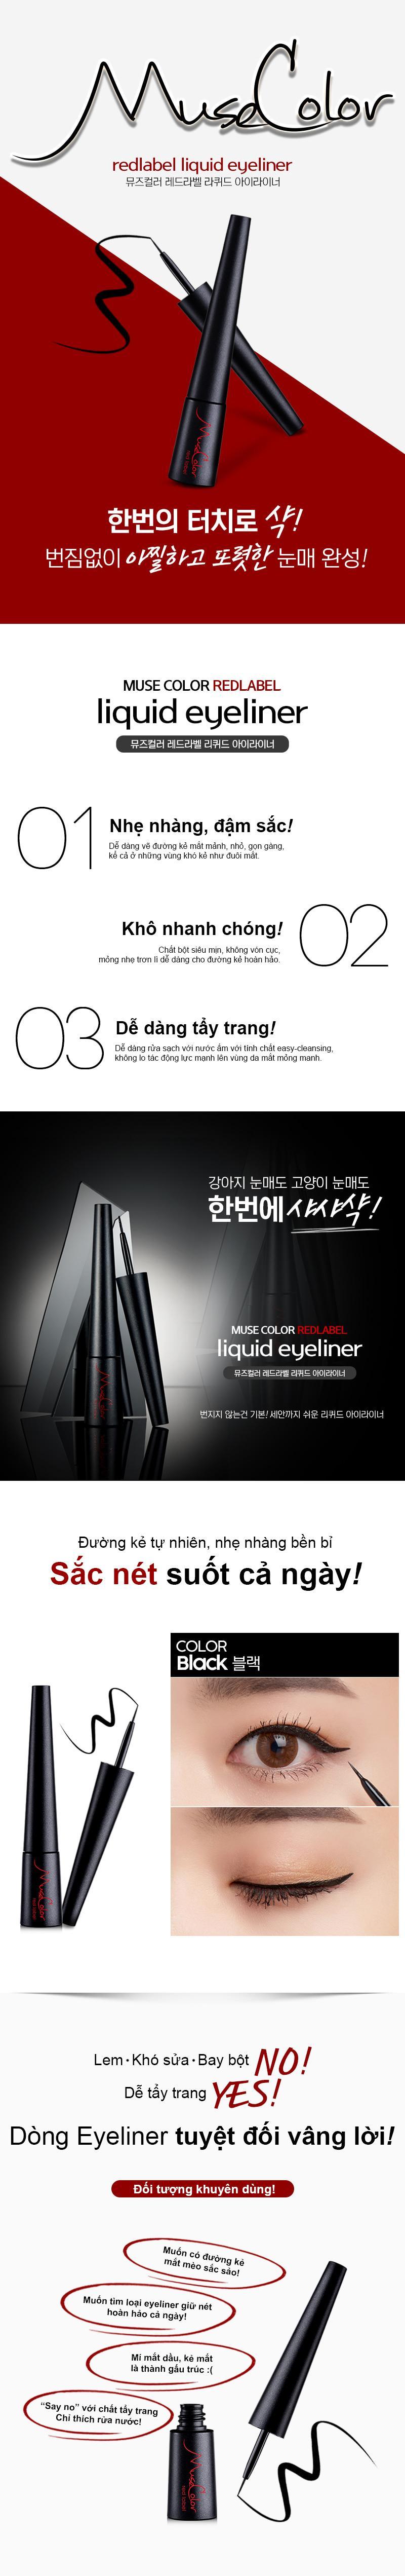 musecolor_redlabel_liquid_eyeliner.jpg